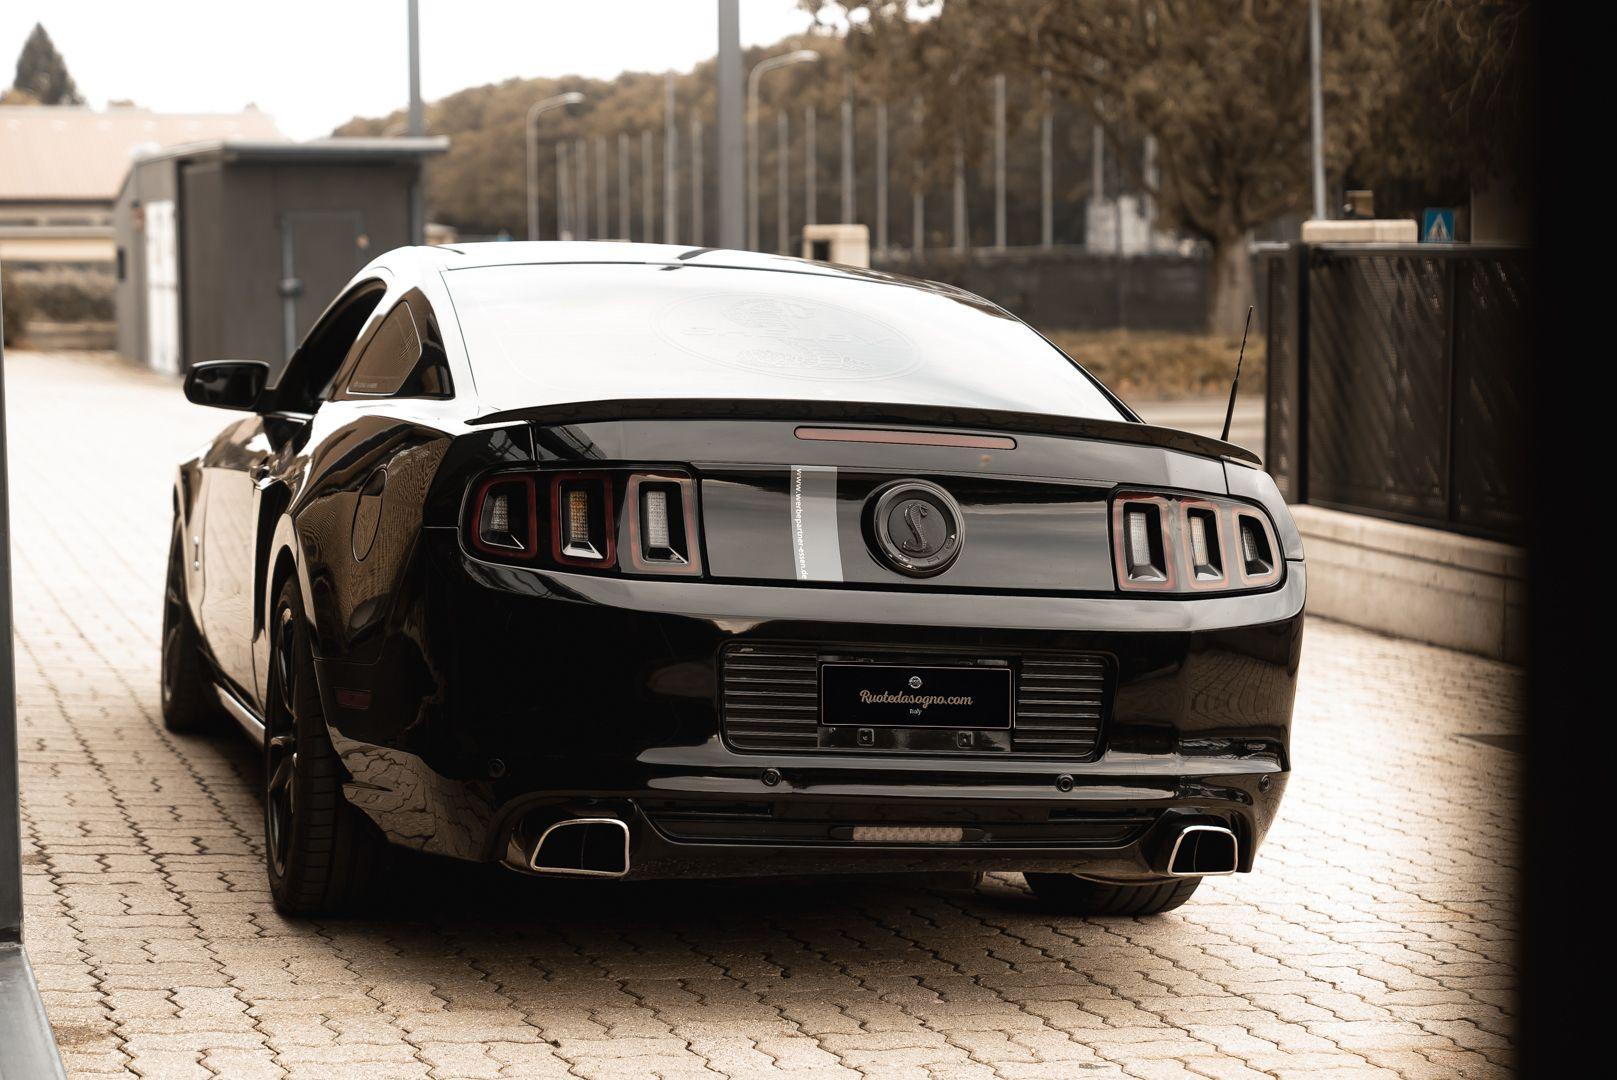 2012 Ford Mustang 5.0 V8 82072